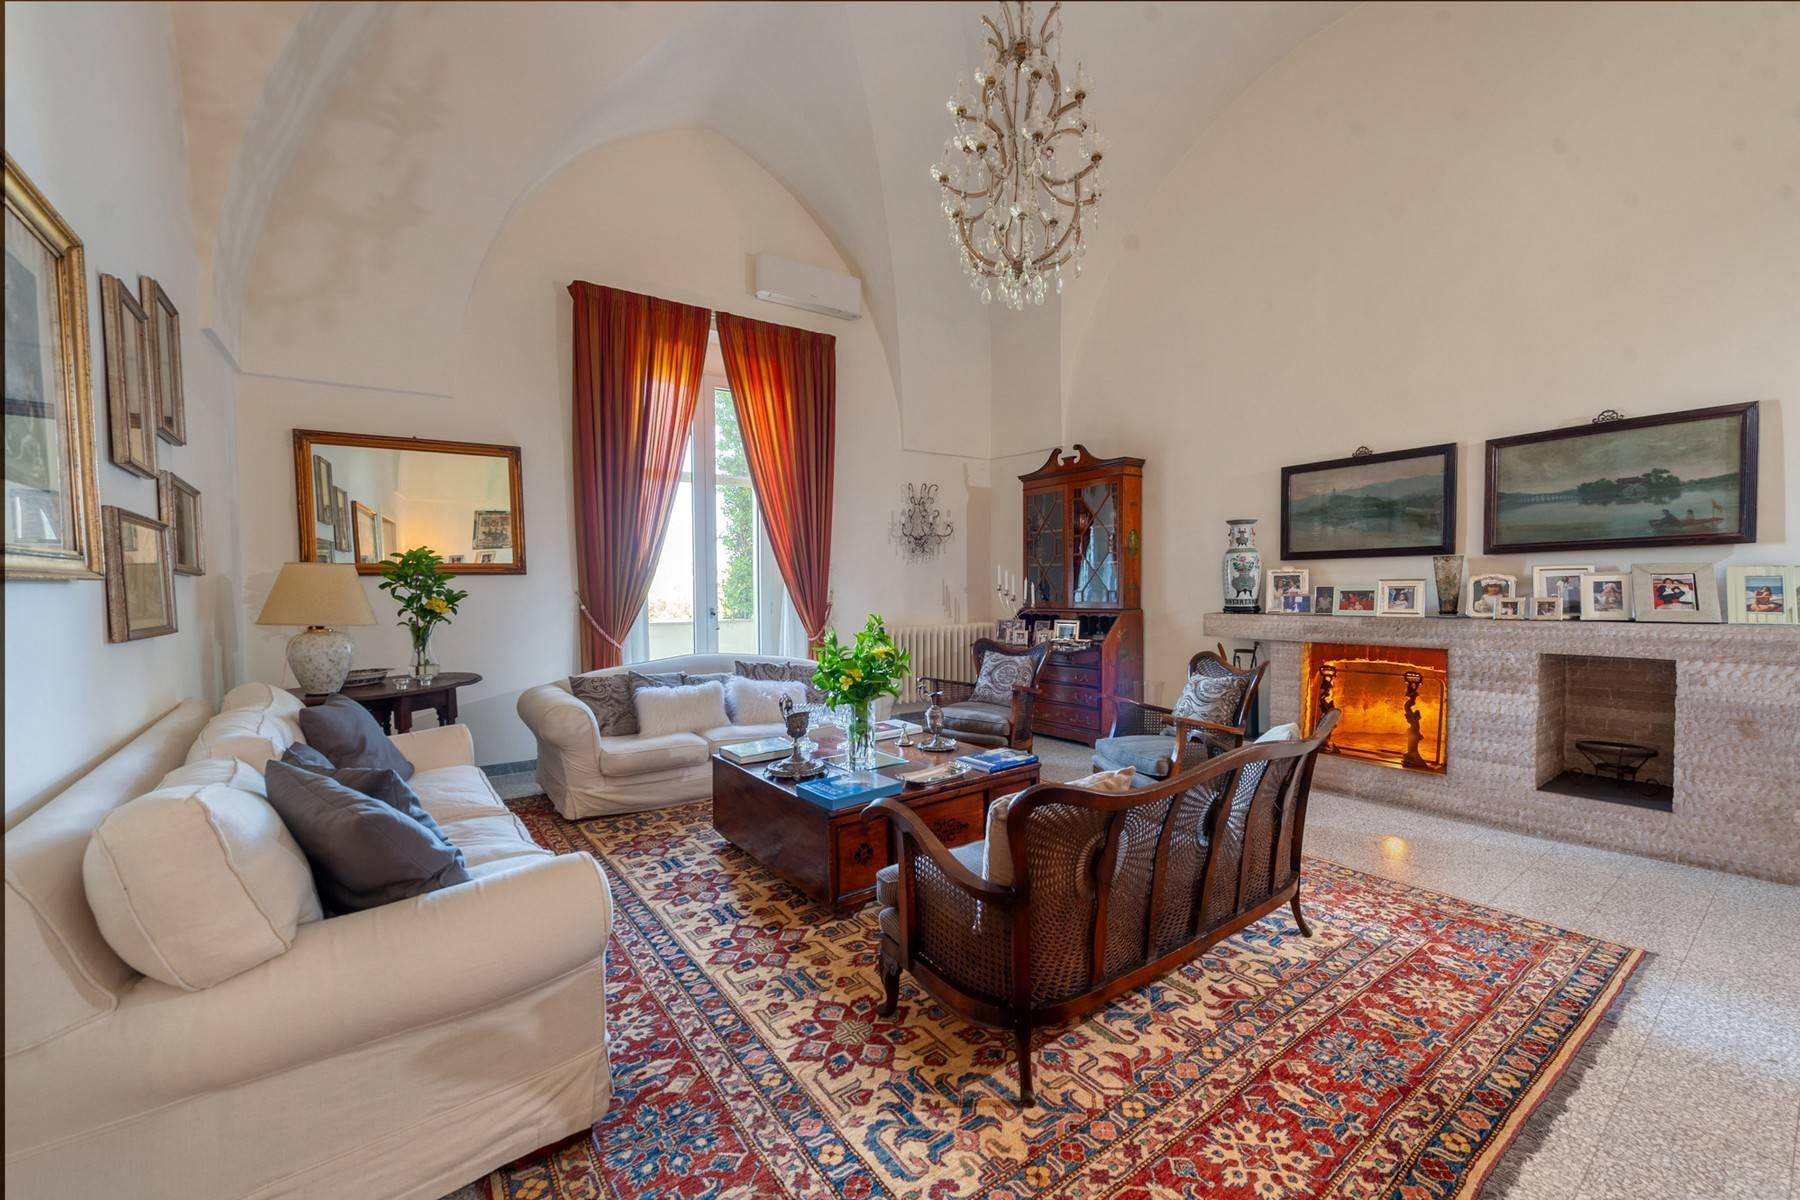 Splendida villa gentilizia del '600 circondata da agrumeti - 11